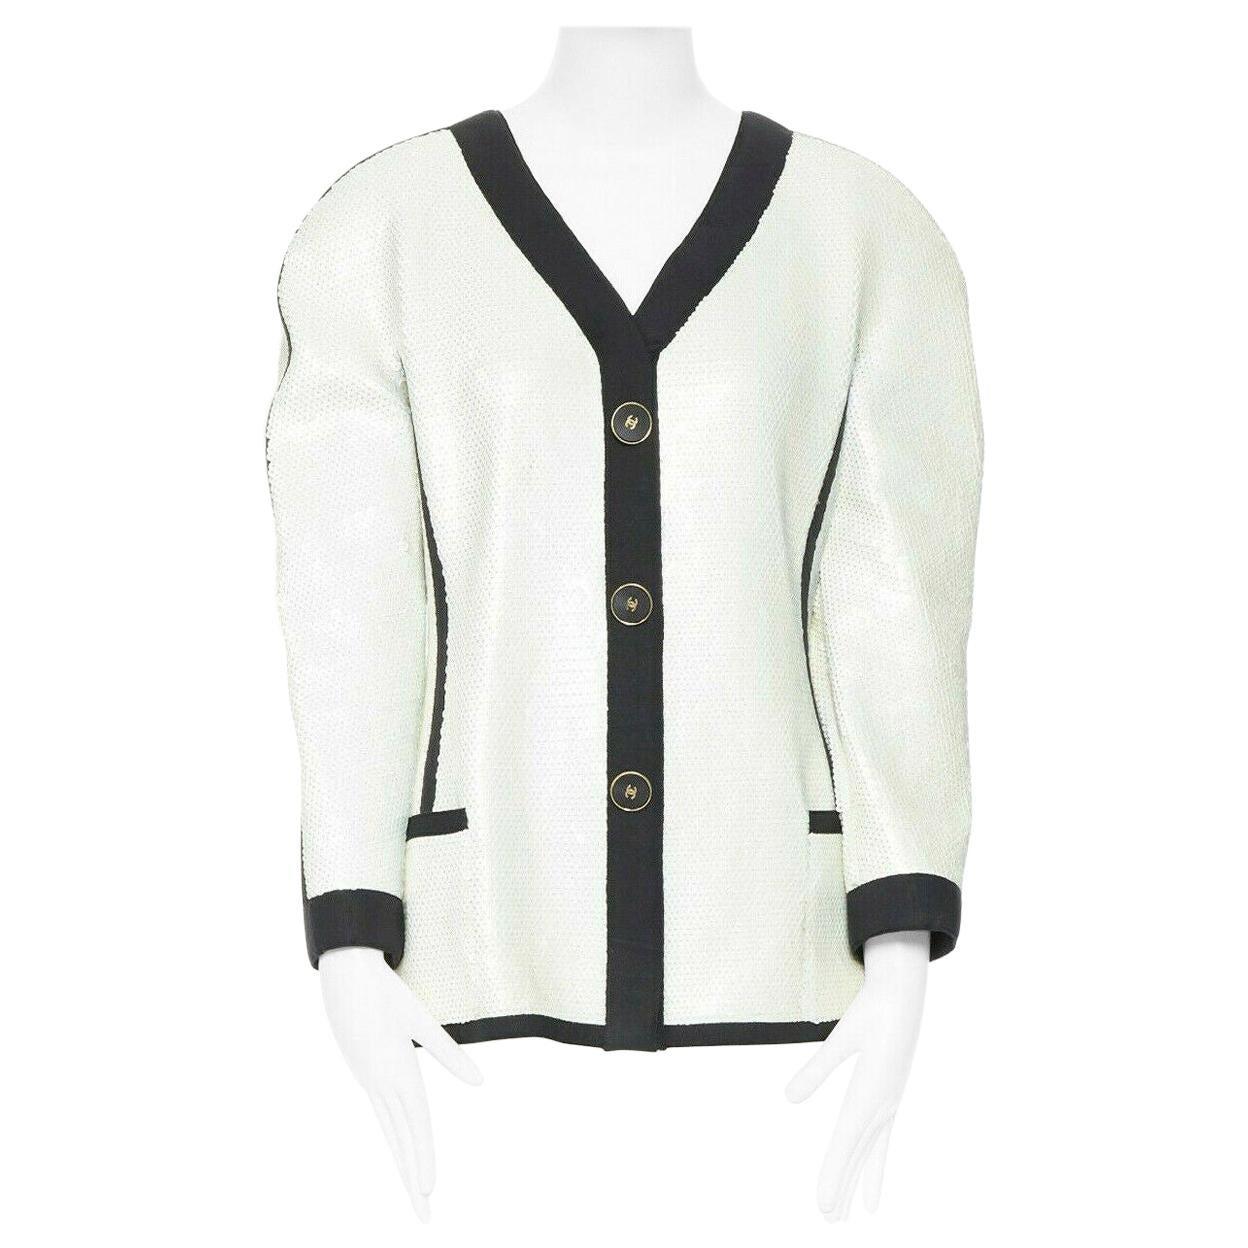 runway CHANEL SS91 white sequin black grosgrain trim scuba zipper jacket FR44